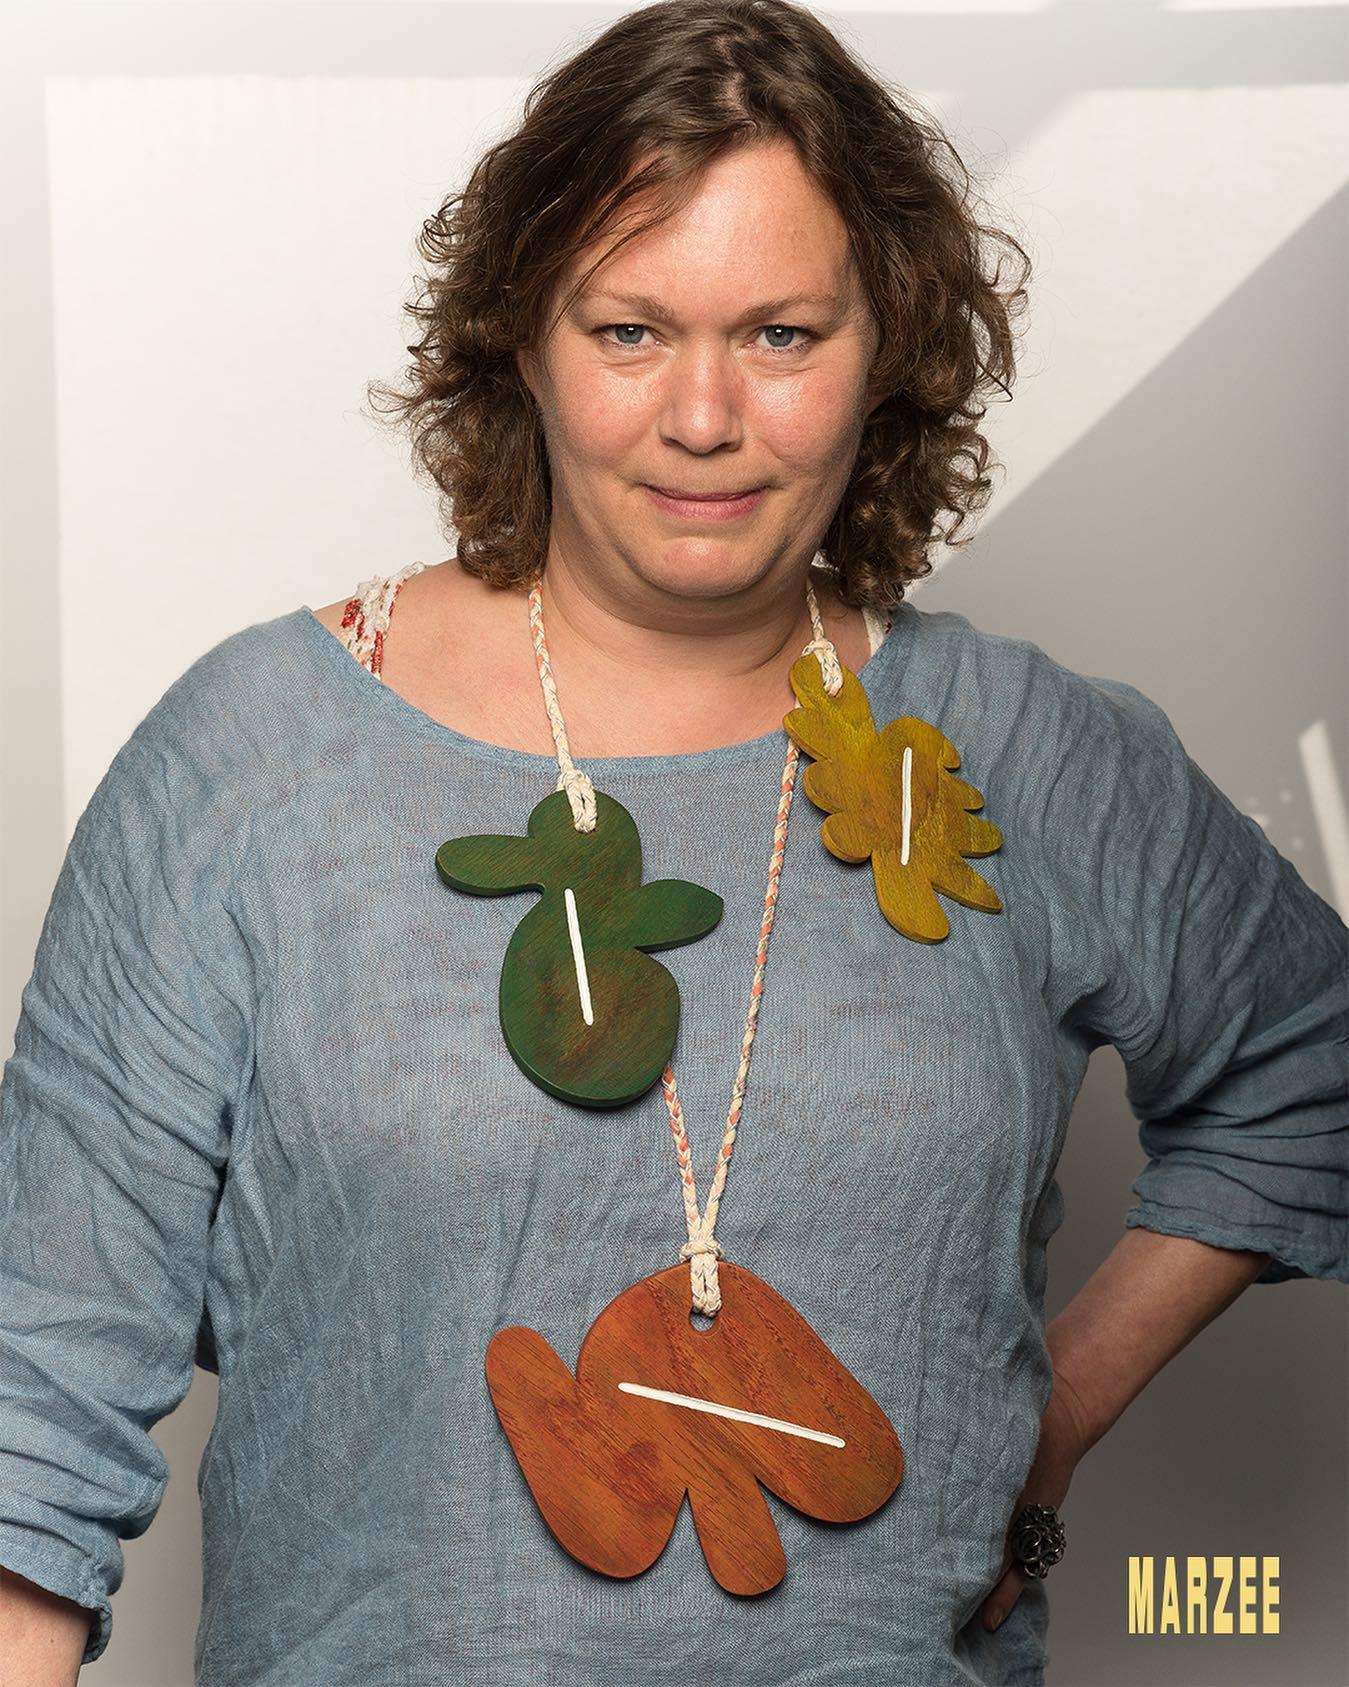 Esther Doornbusch draagt halssieraad Julia Walter, 24 mei 2019, foto Galerie Marzee/Michiel Heffels, portret, hout, koord, verf, ring, Georg Dobler, gezwart zilver, robijnen